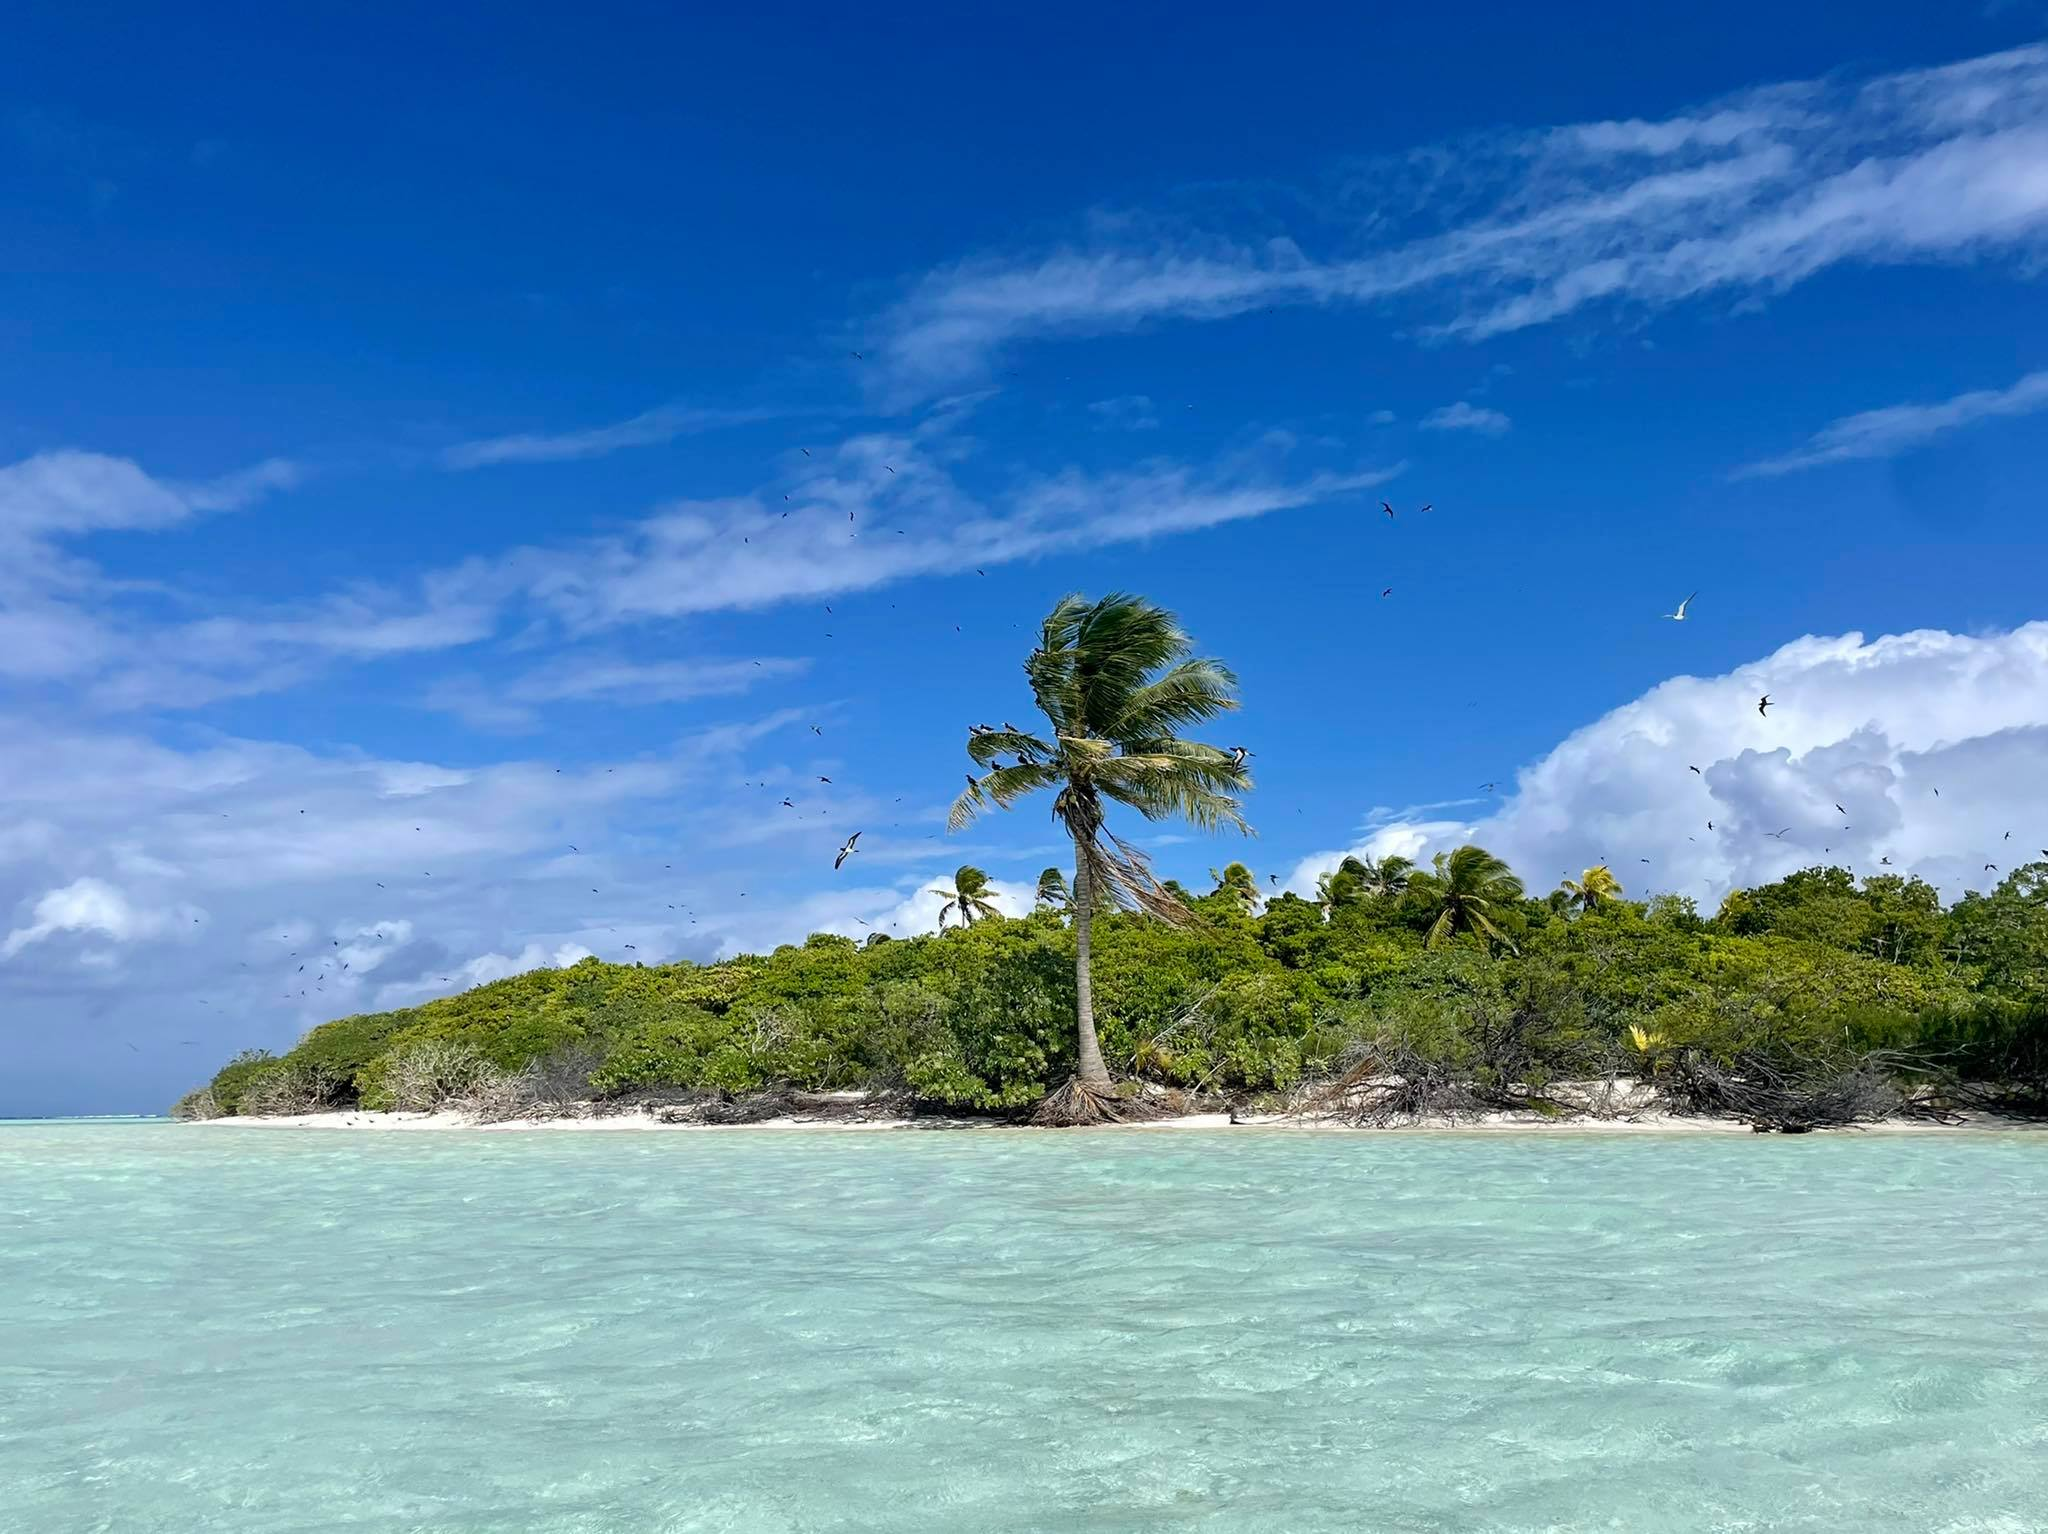 http://tahitivoileetlagon.com/wp-content/uploads/2021/07/vol-oiseaux-TETIAROA.jpg